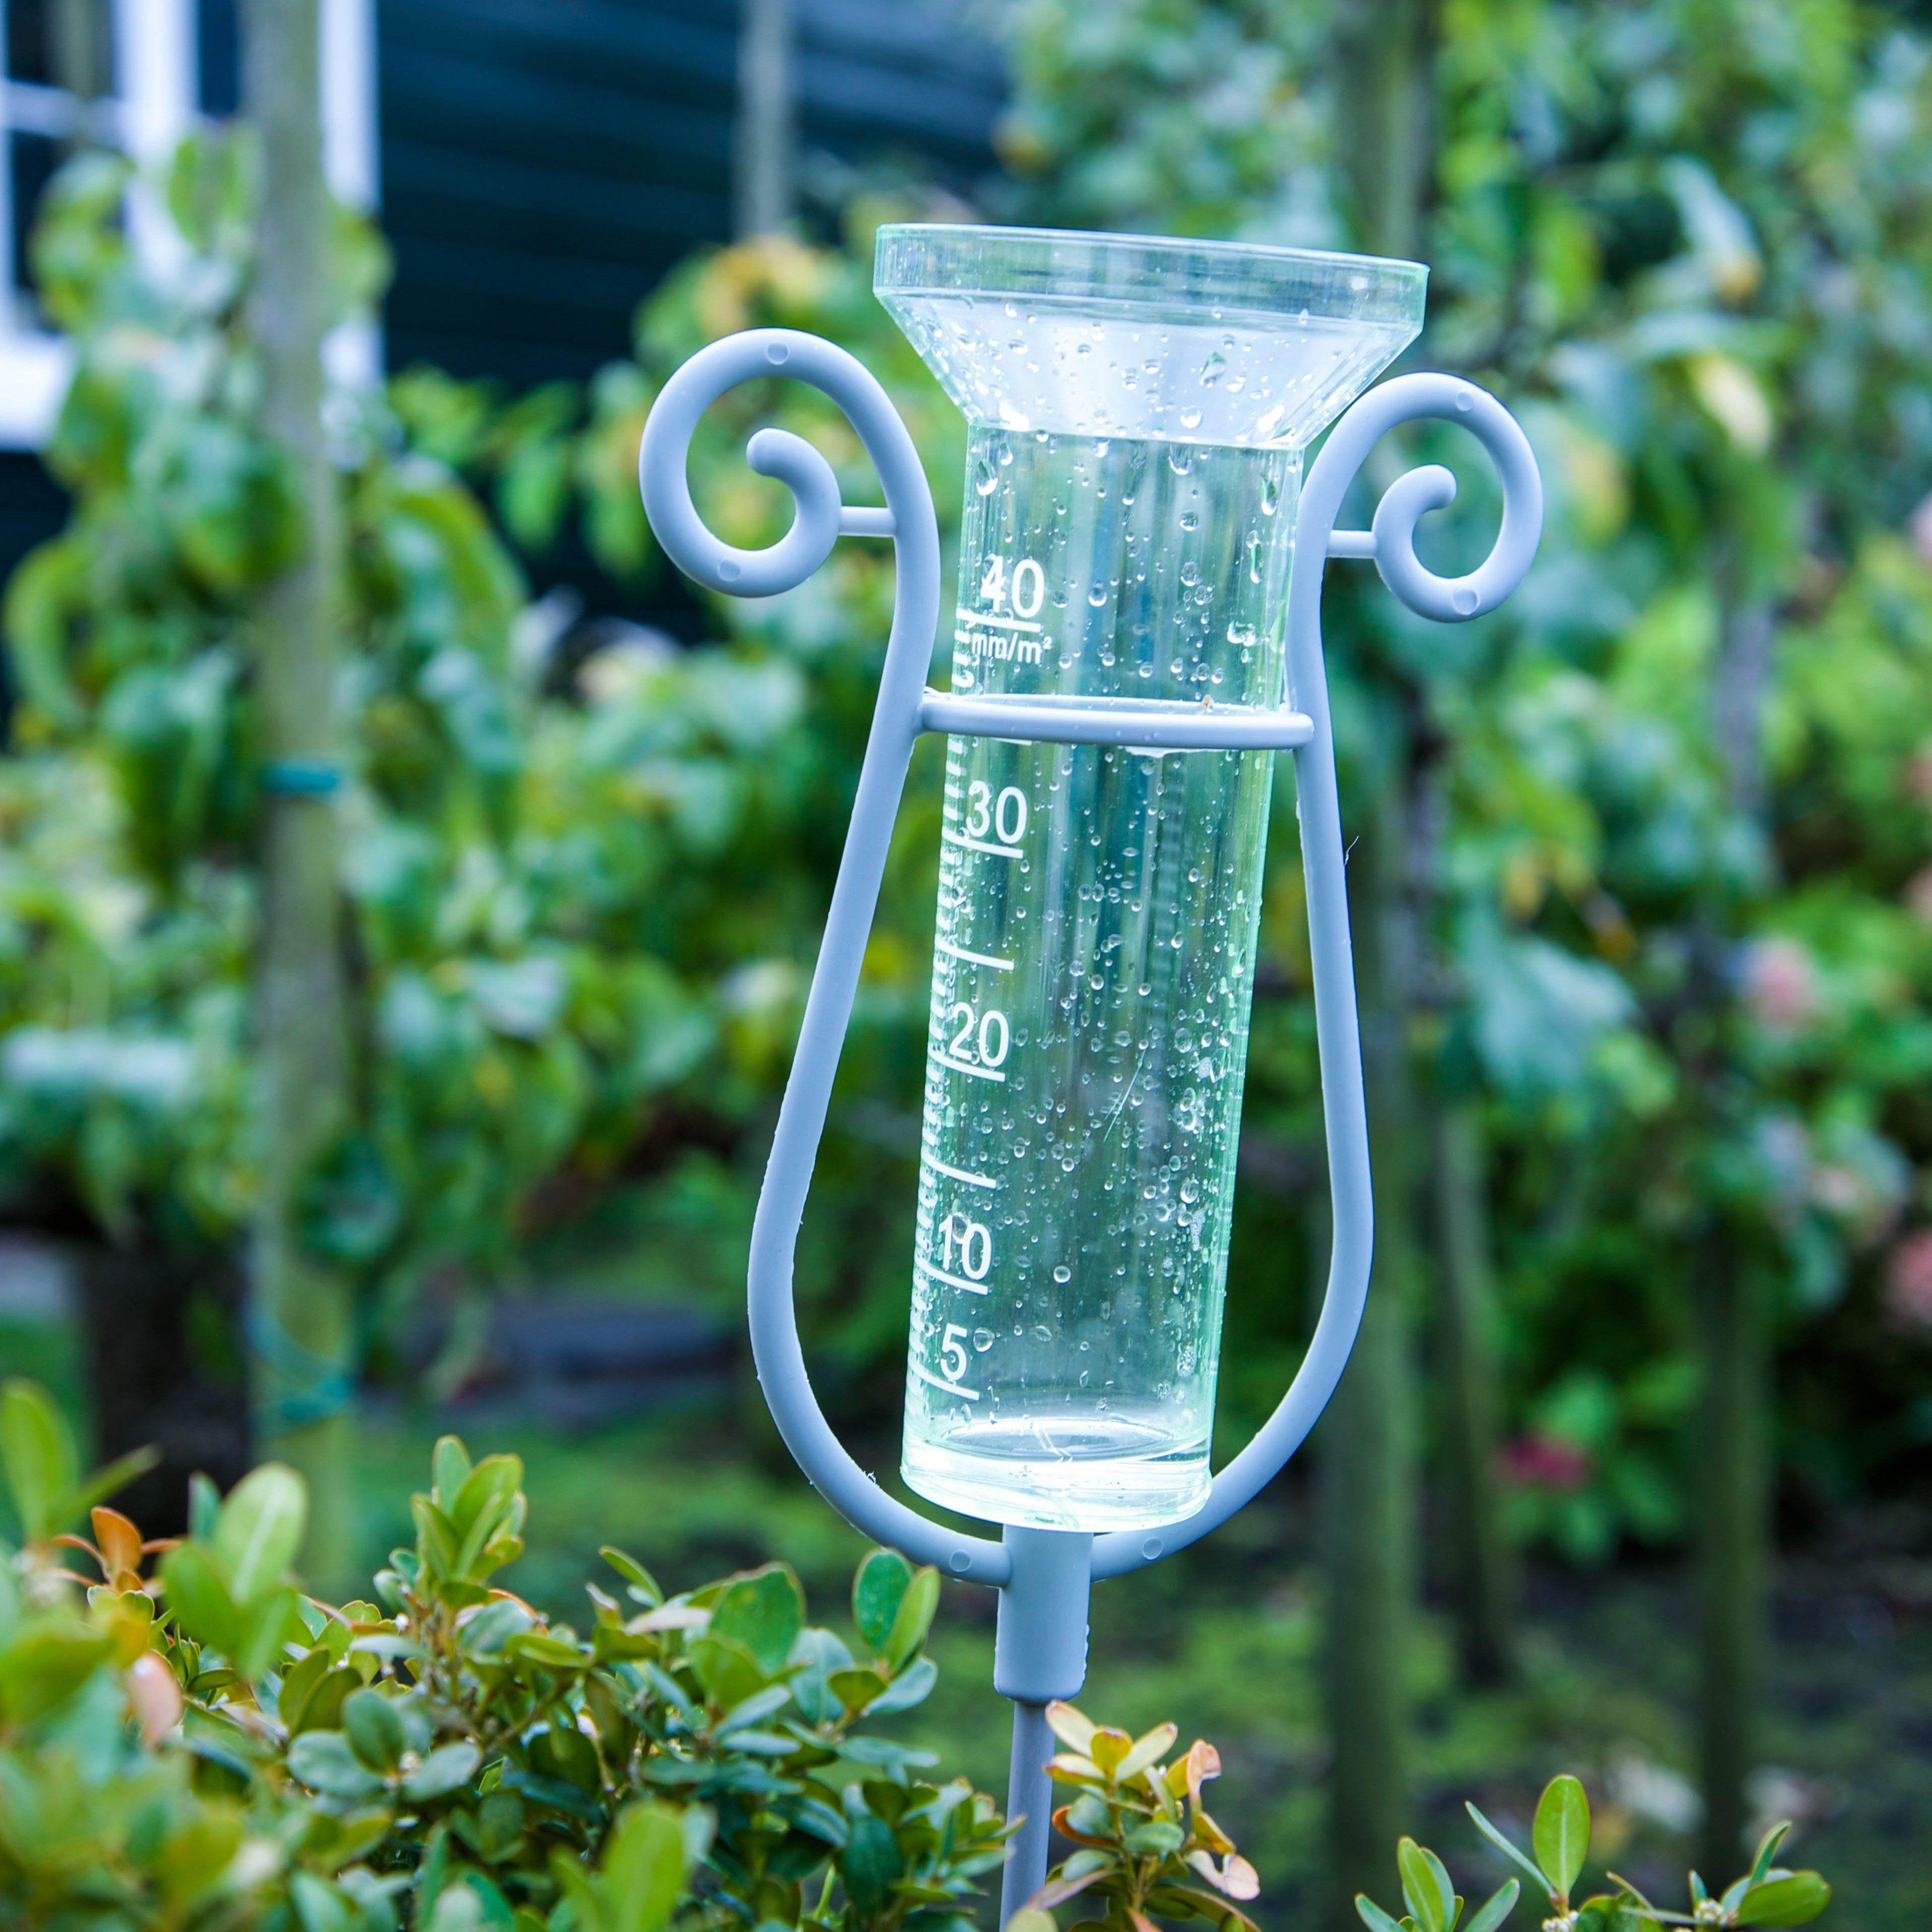 rain gauge in garden; Shutterstock ID 727027459; Job (TFH, TOH, RD, BNB, CWM, CM): TOH Raised Bed Garden